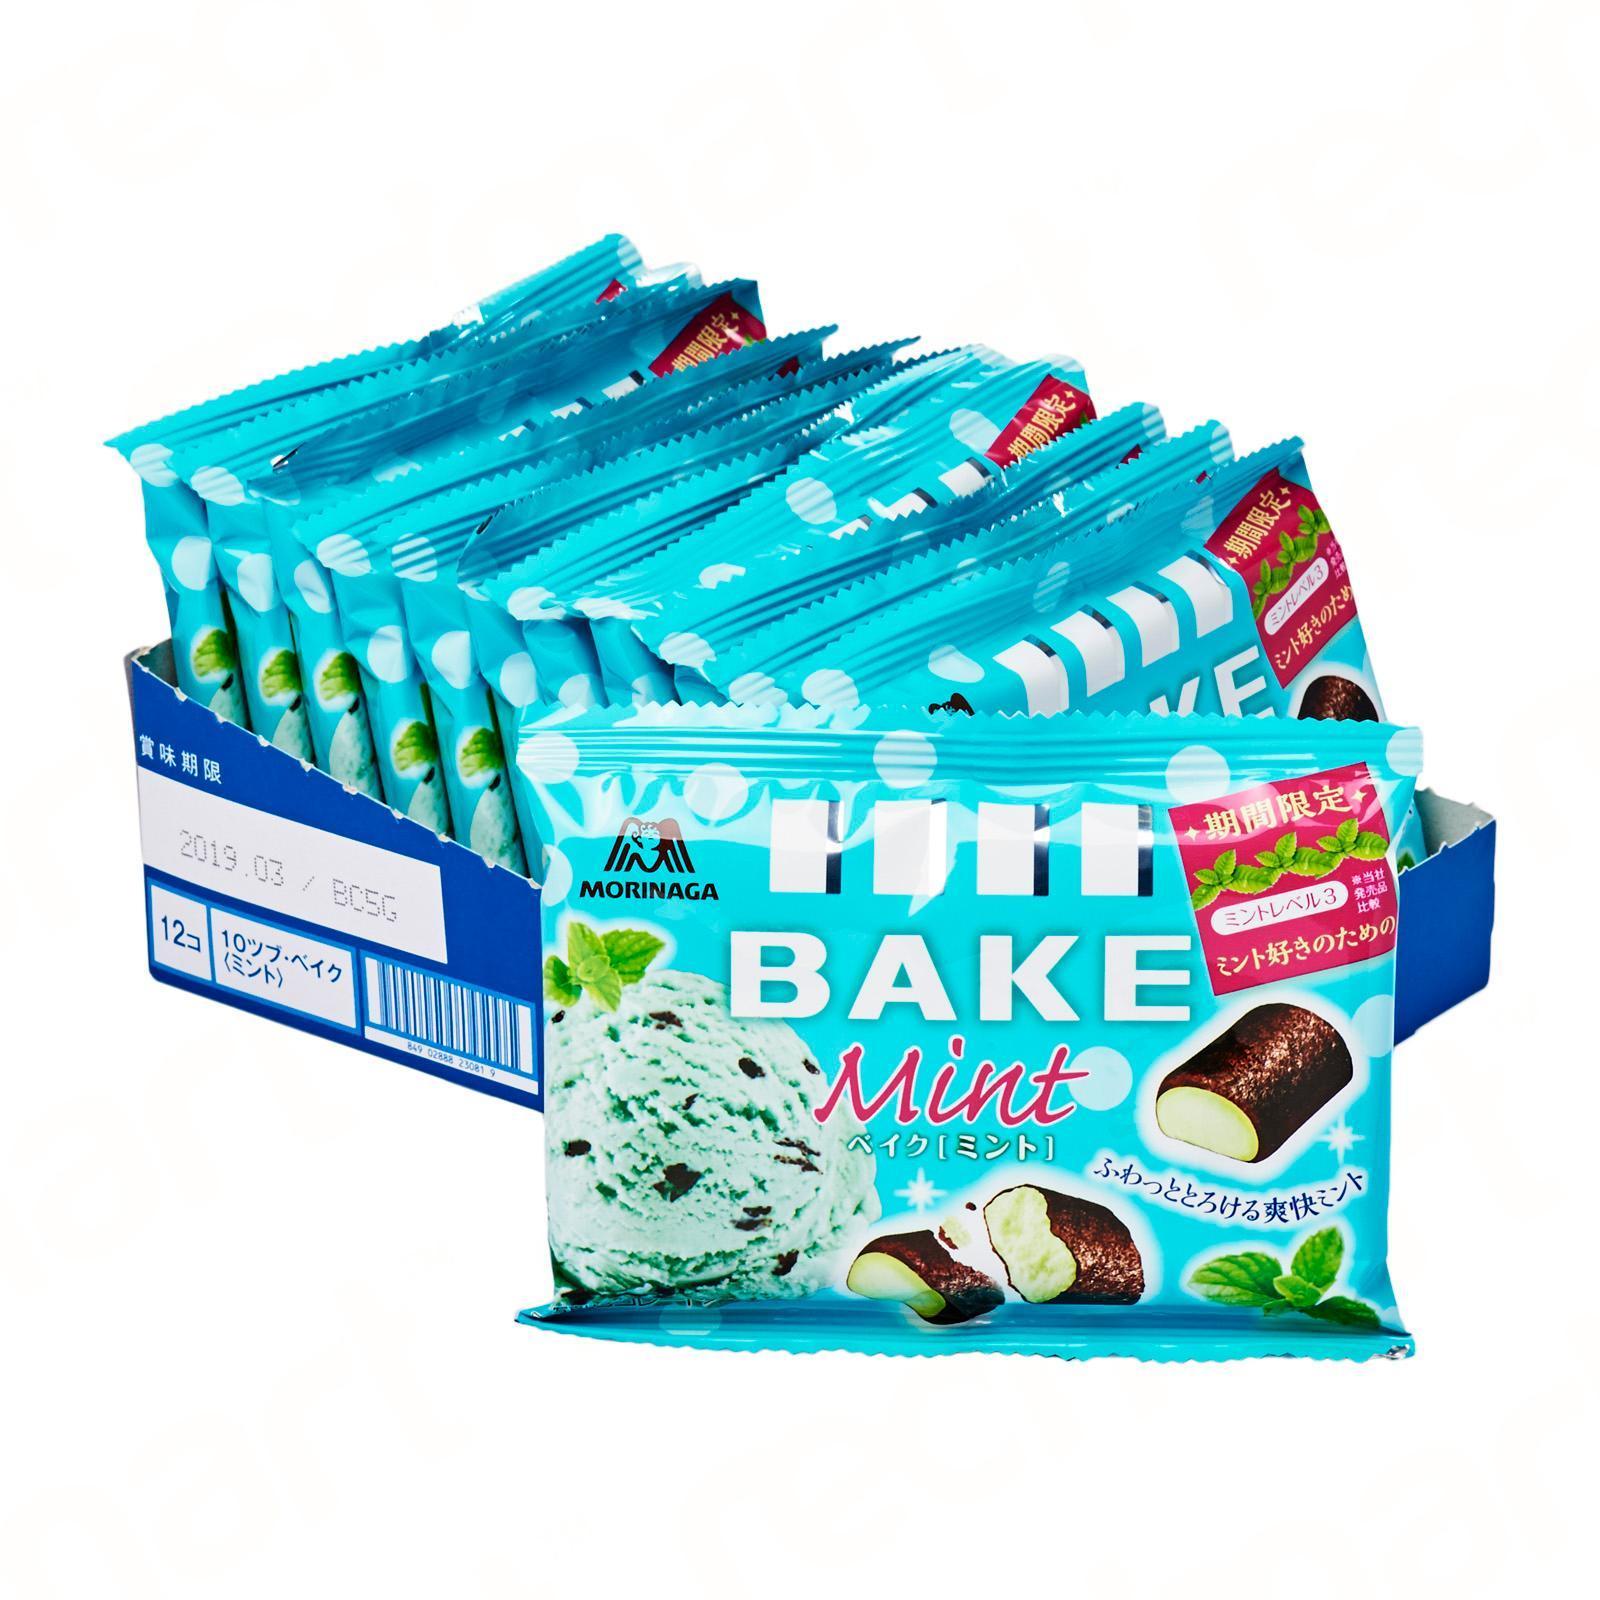 Morinaga Bake Mint Chocolates